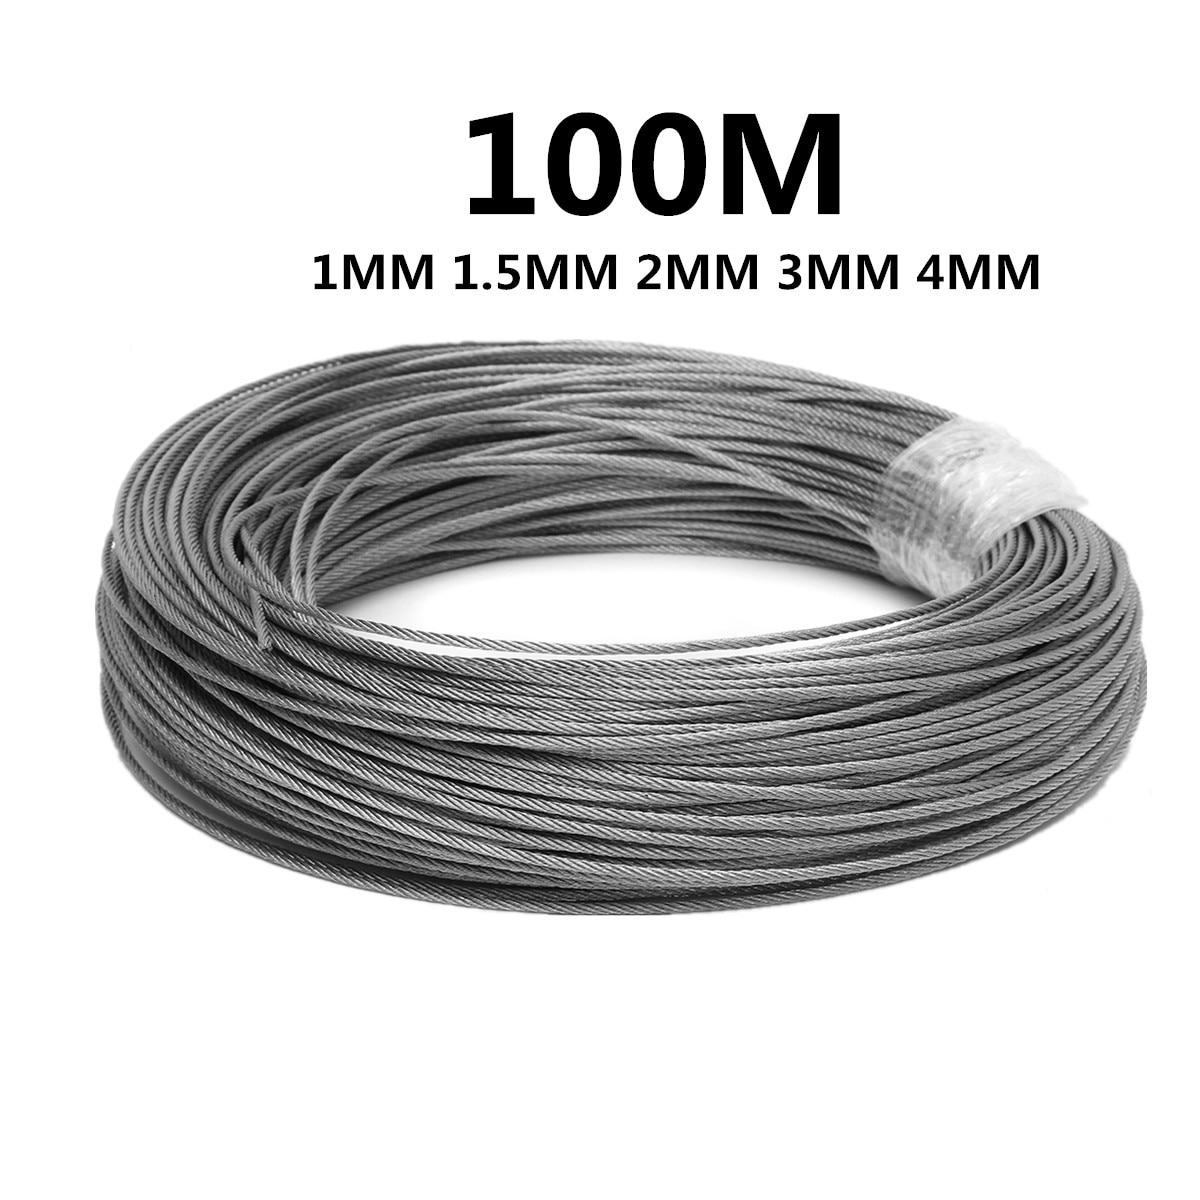 100M 50M304 스테인레스 스틸 1mm 1.5mm 2mm 직경 스틸 와이어 베어 로프 리프팅 케이블 라인 빨랫줄 Rustproof 7X7